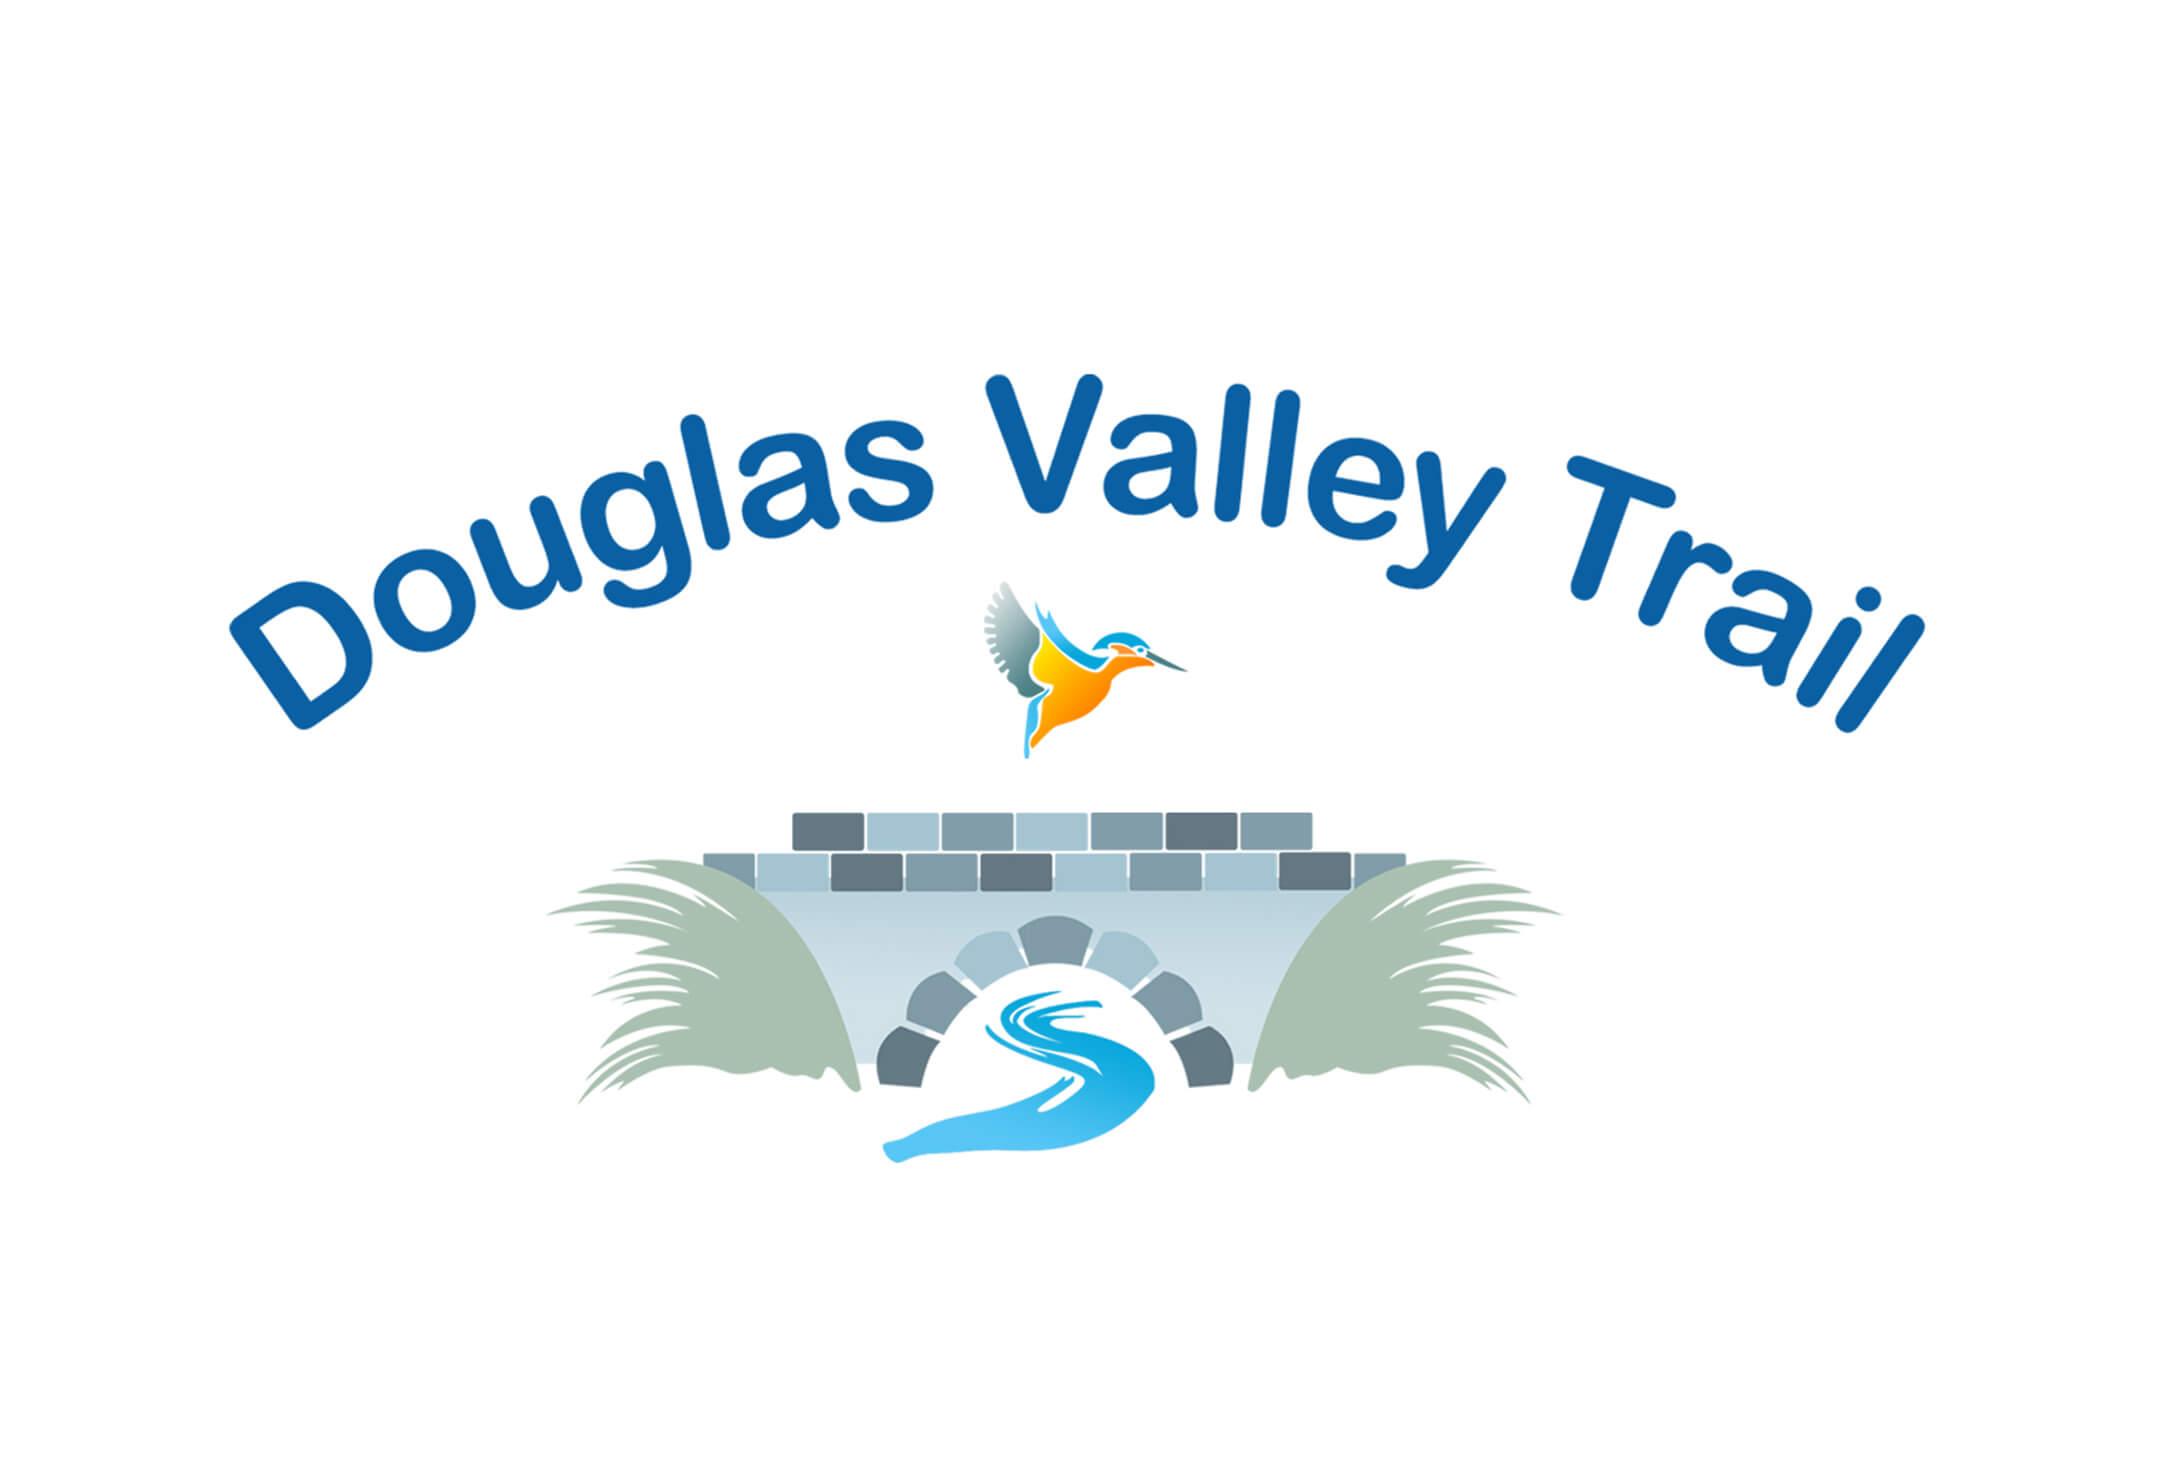 Douglad Valley Trail